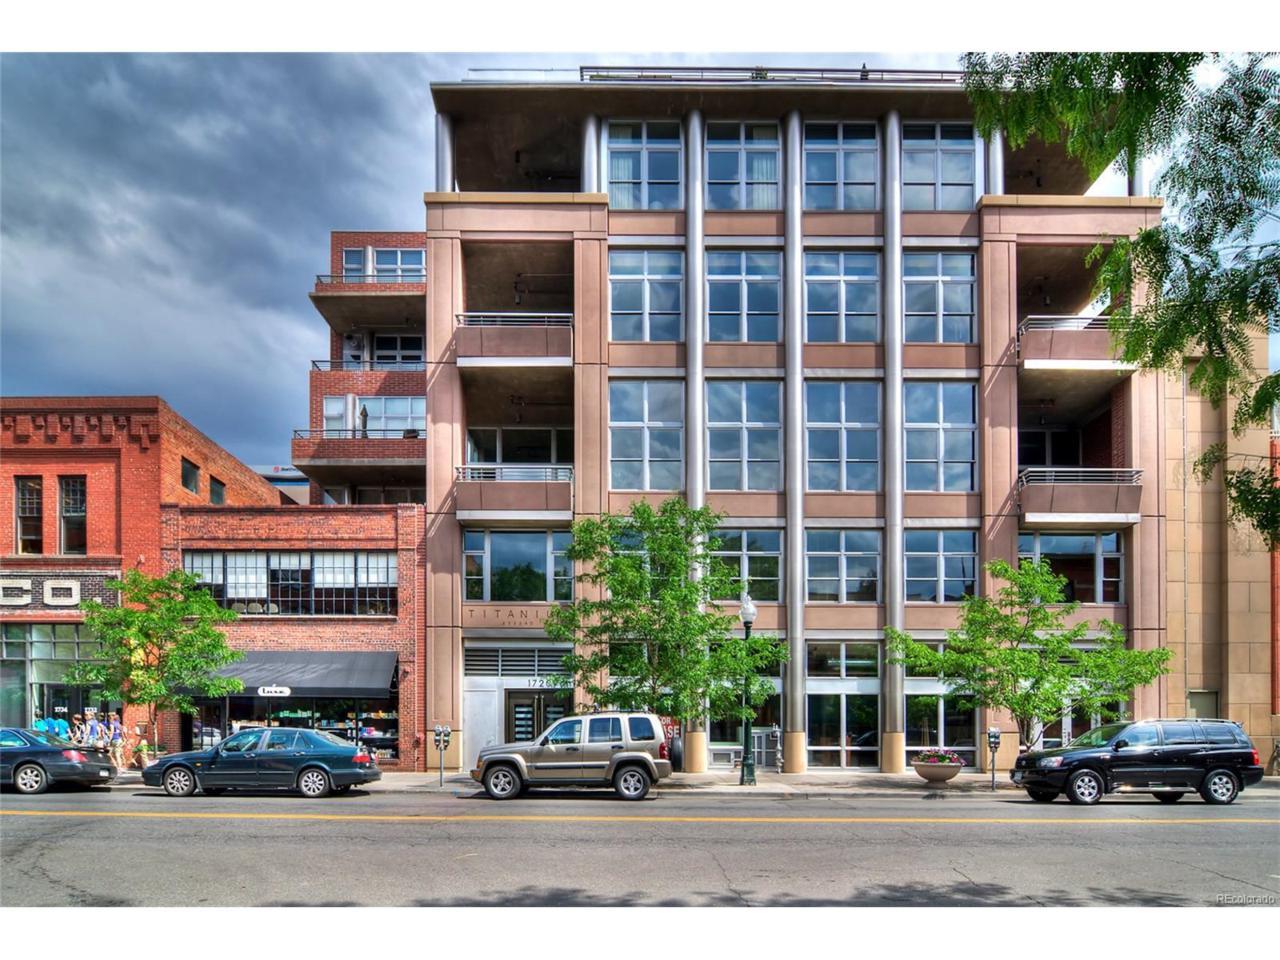 1720 Wazee Street 4C, Denver, CO 80202 (MLS #6245943) :: 8z Real Estate